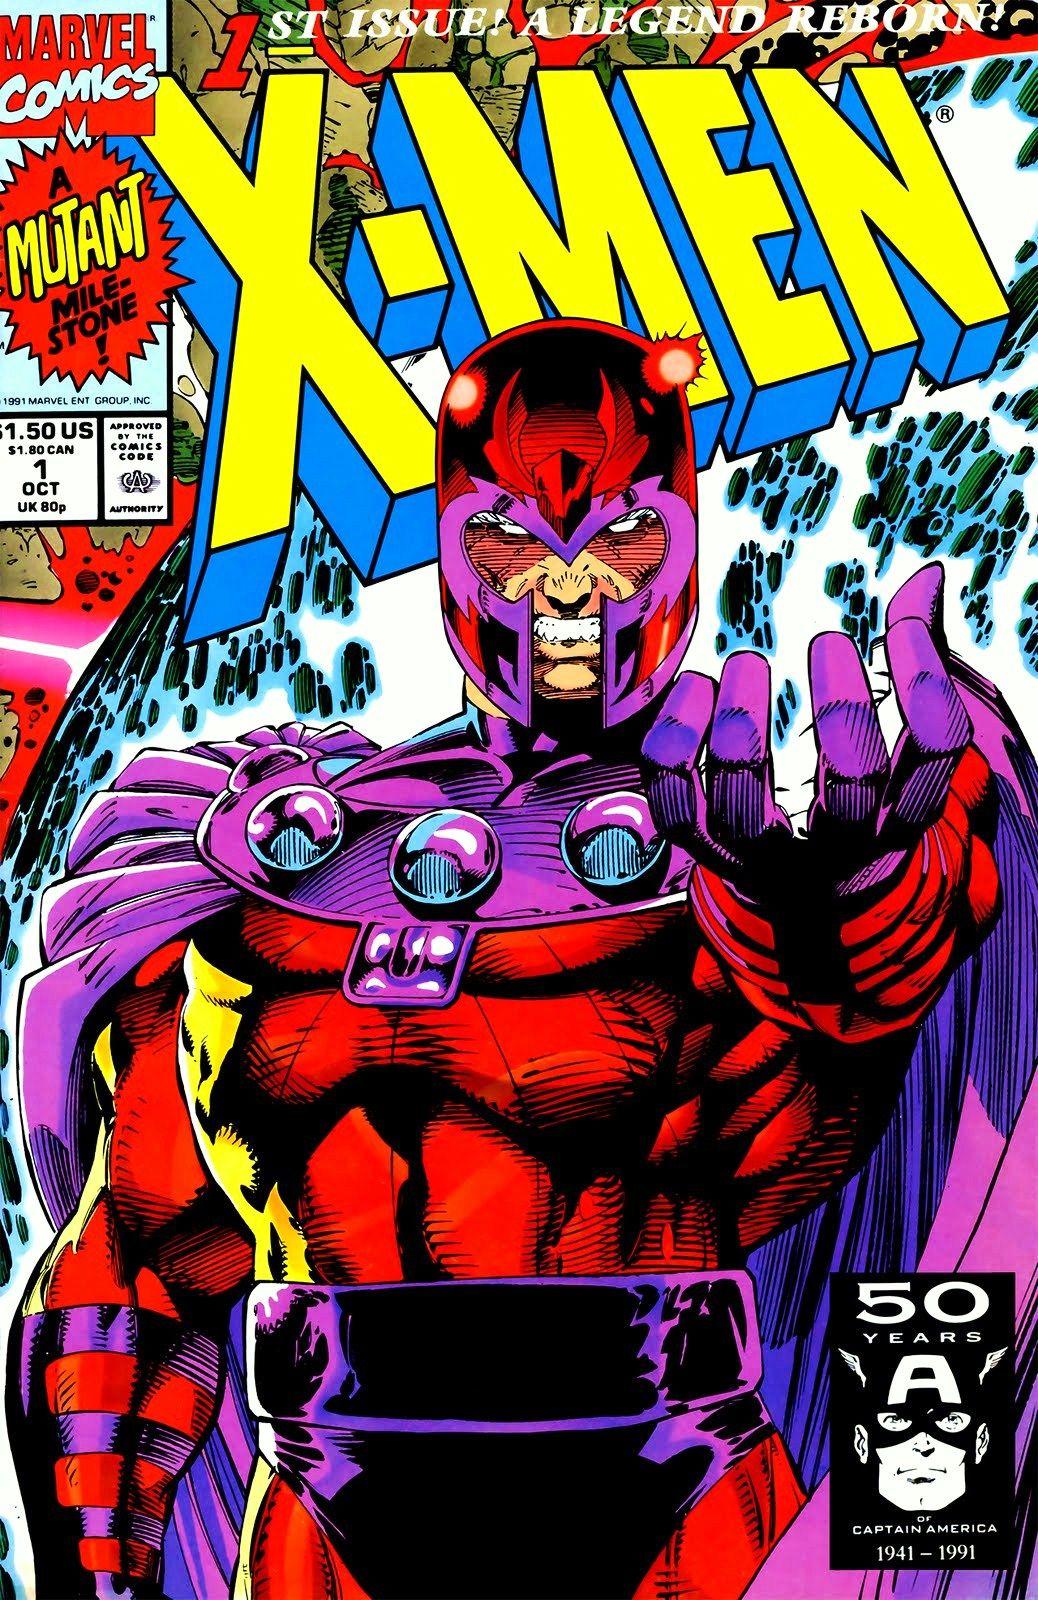 X Men 1 Cover Art By Jim Lee Is A Work Of Art Worth Framing Marvel Comics Comics Marvel Comic Books Marvel Comics Covers